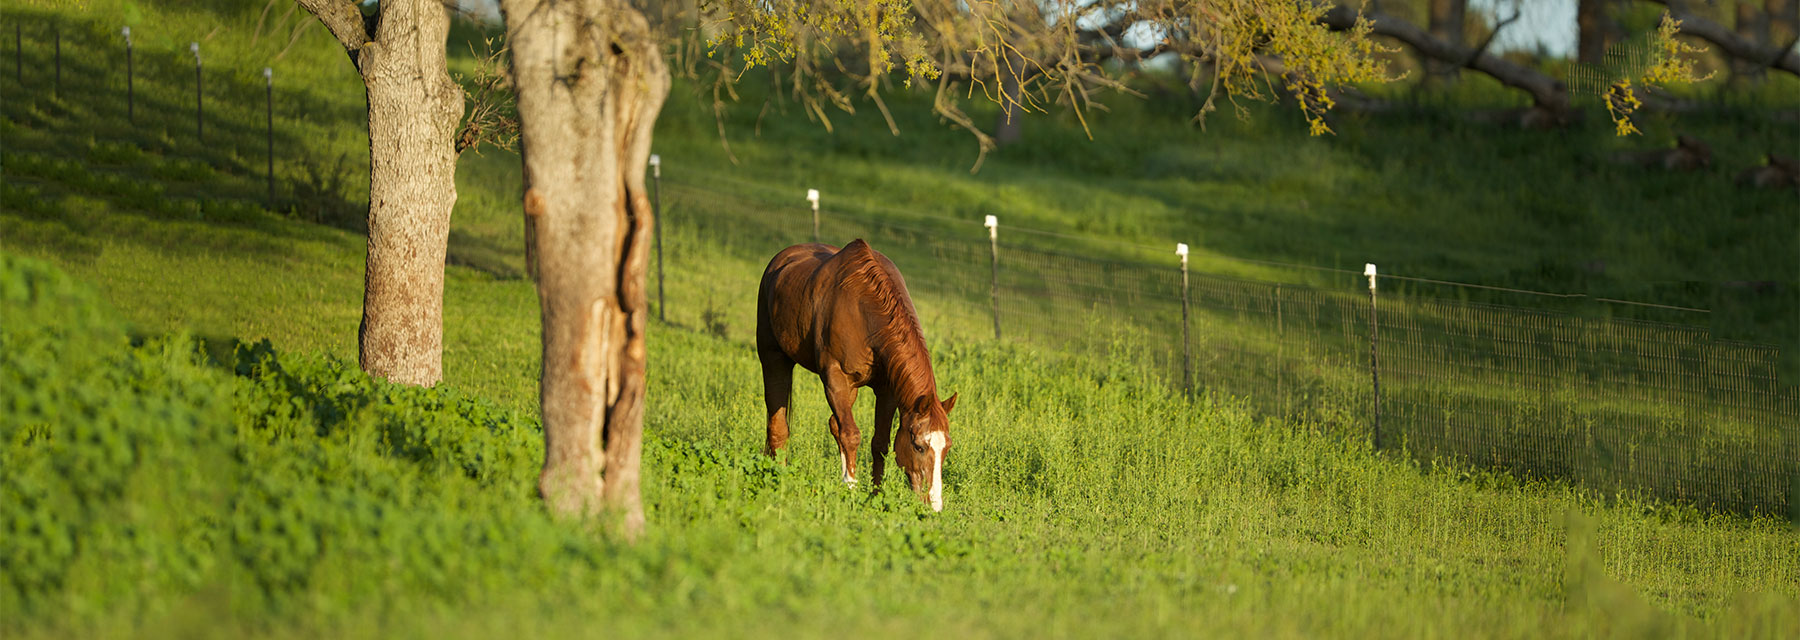 Senior Horse Supplement Supplements For Older Horses Equine